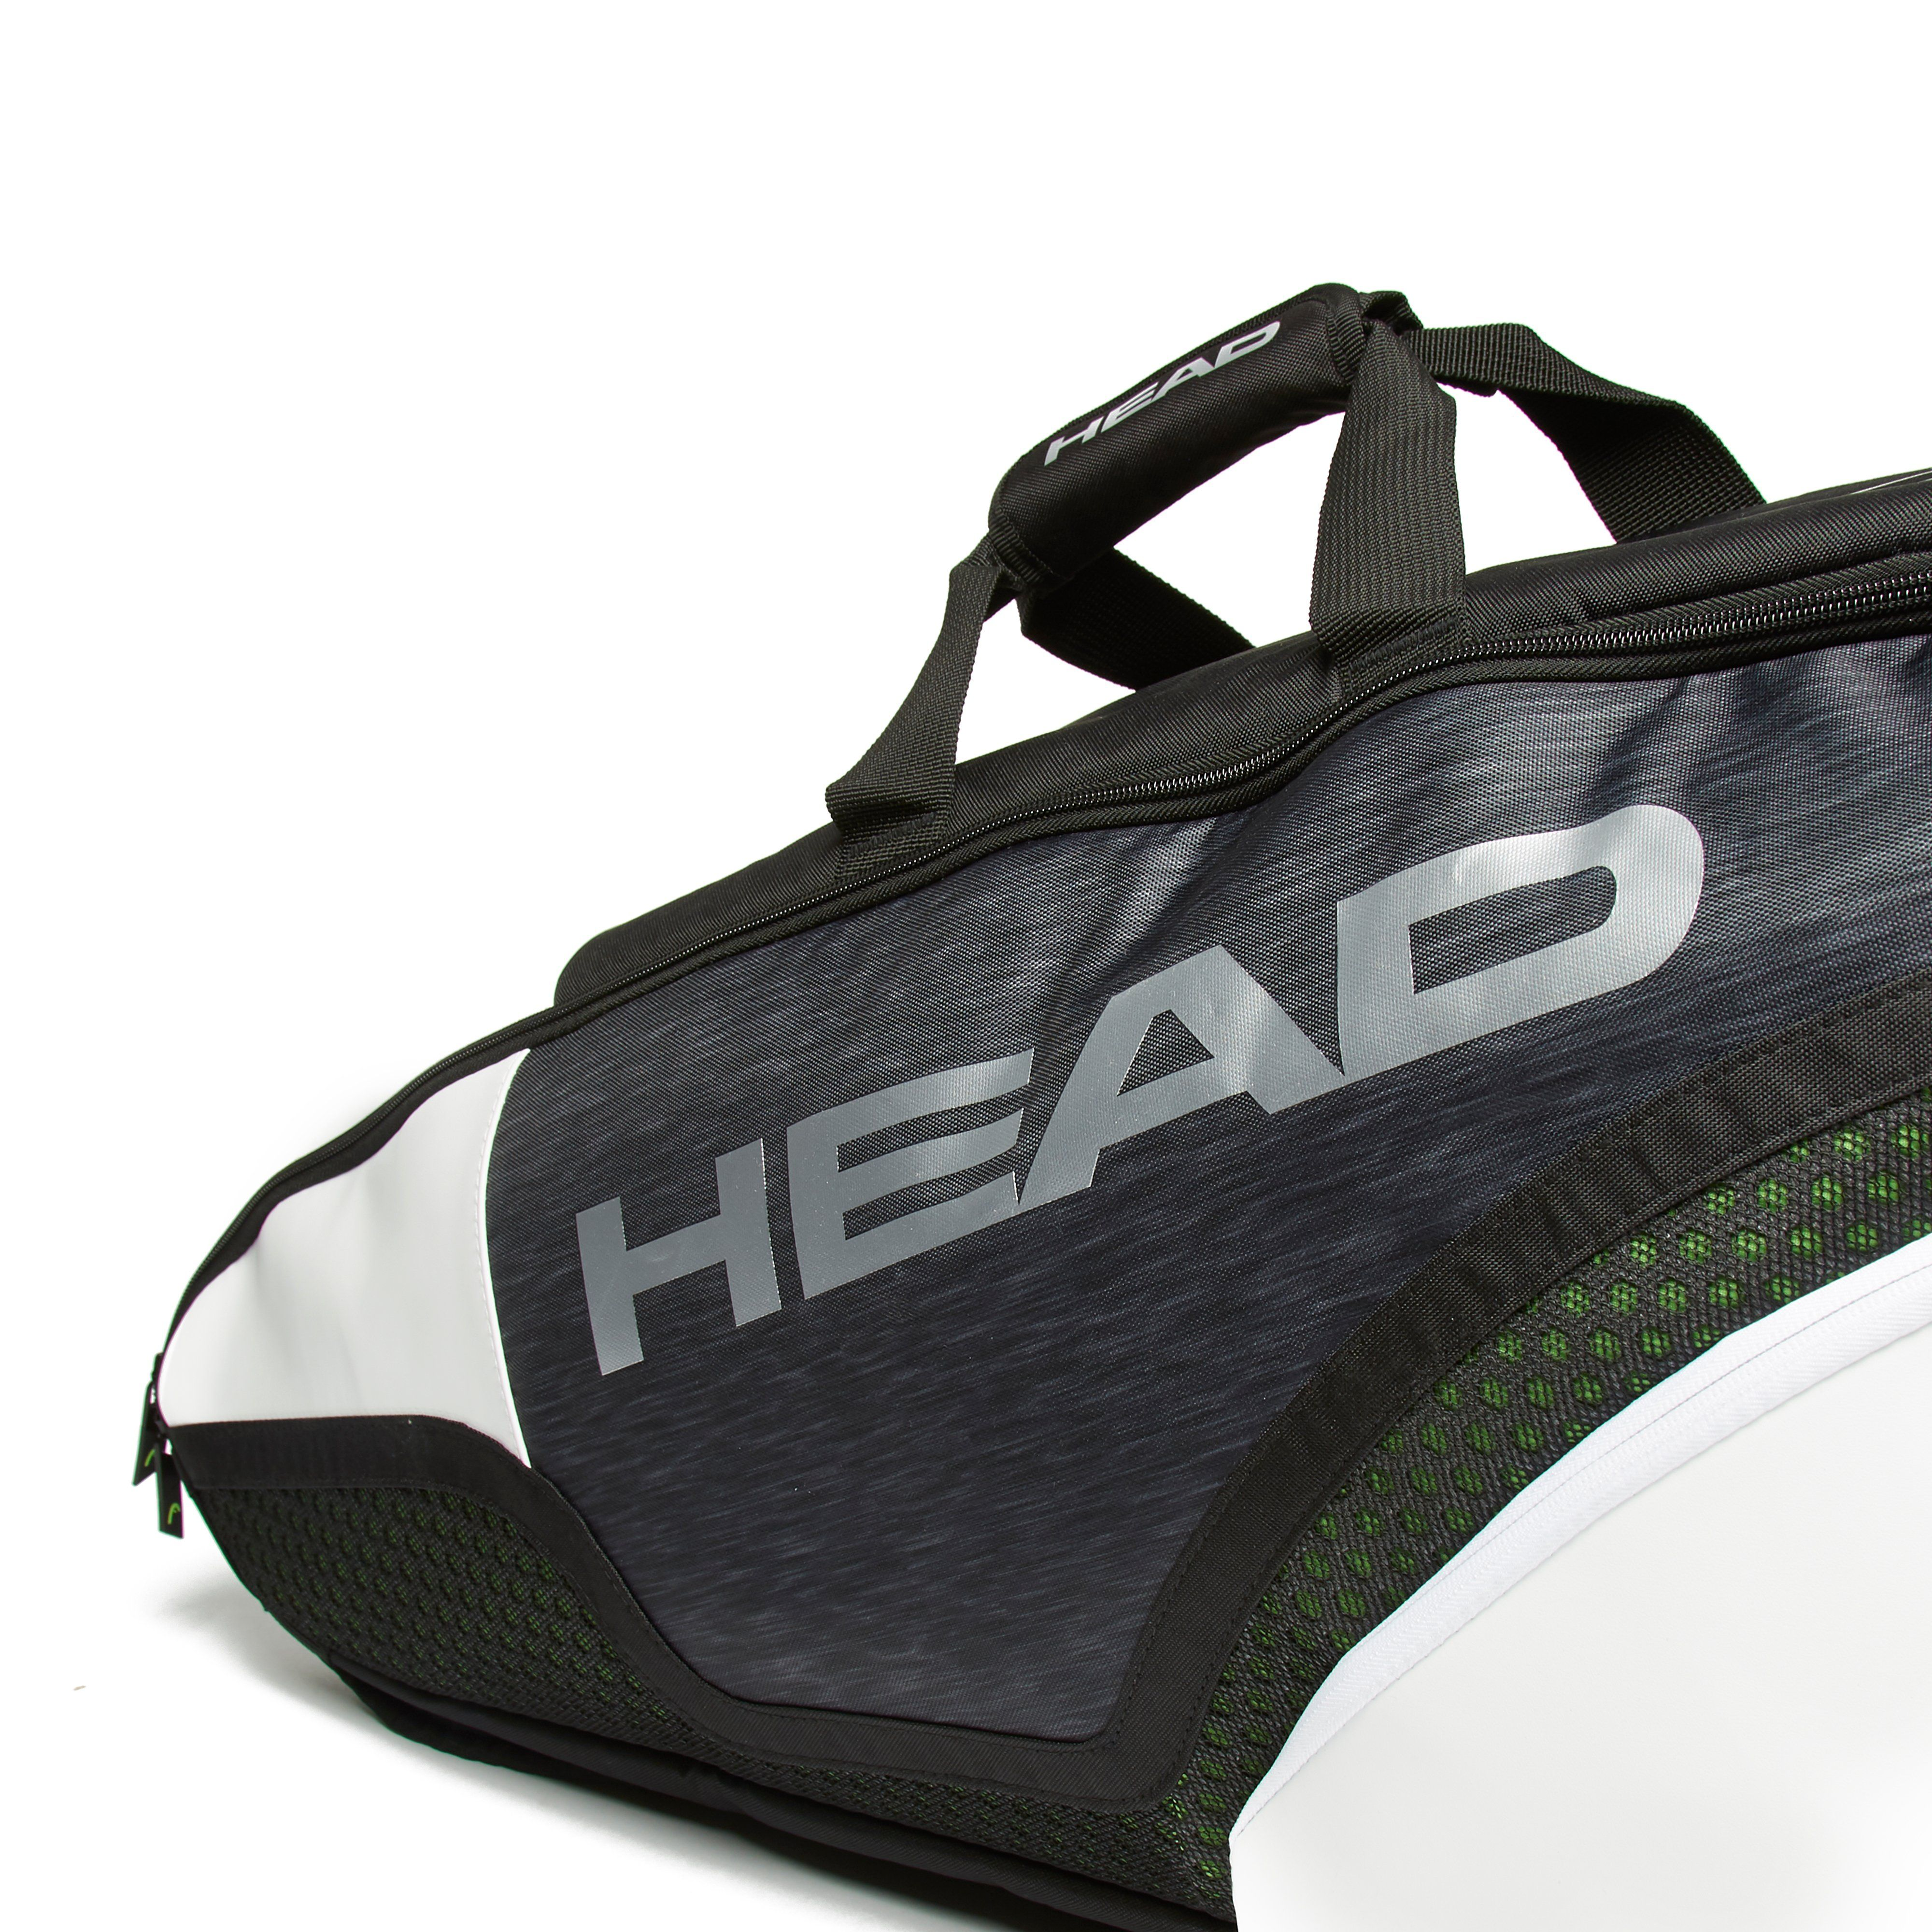 Head Djokovic 6R Combi Racket Bag